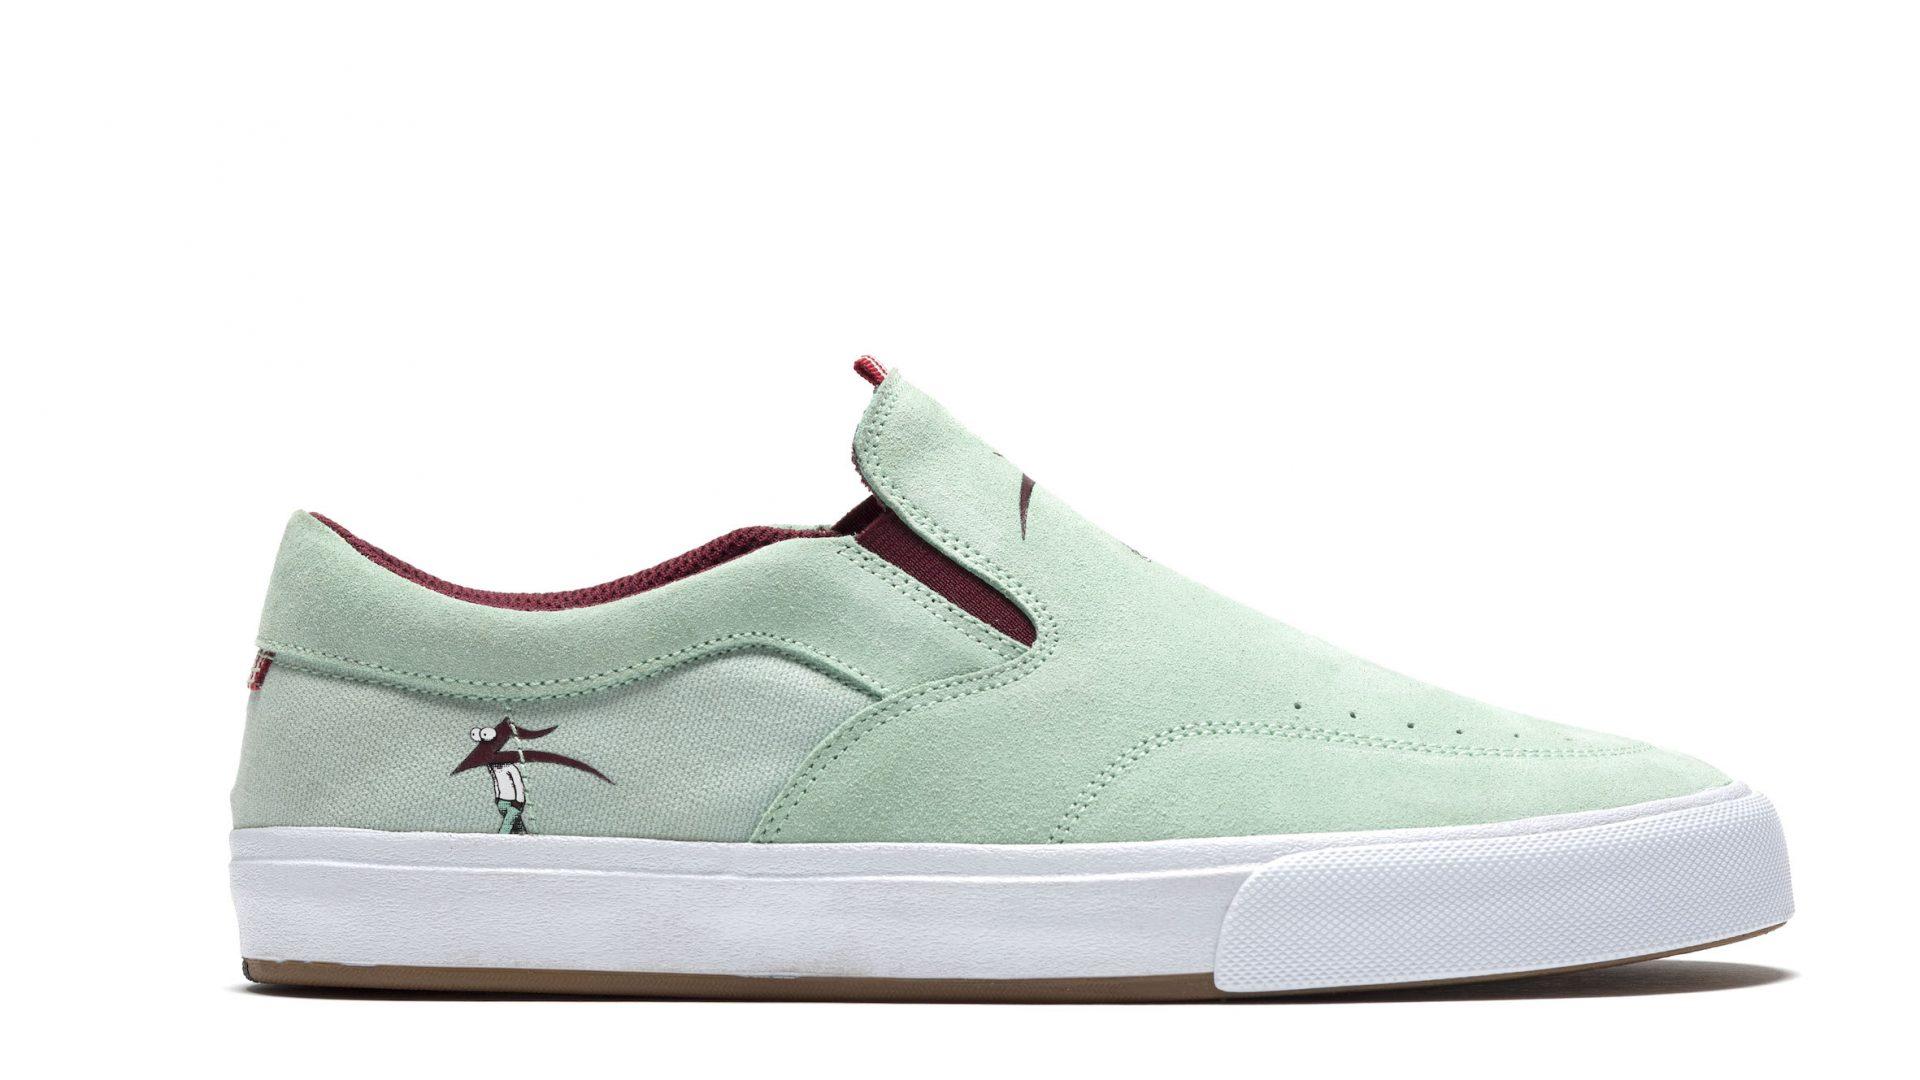 Lakai FW20/21 Skate Shoes